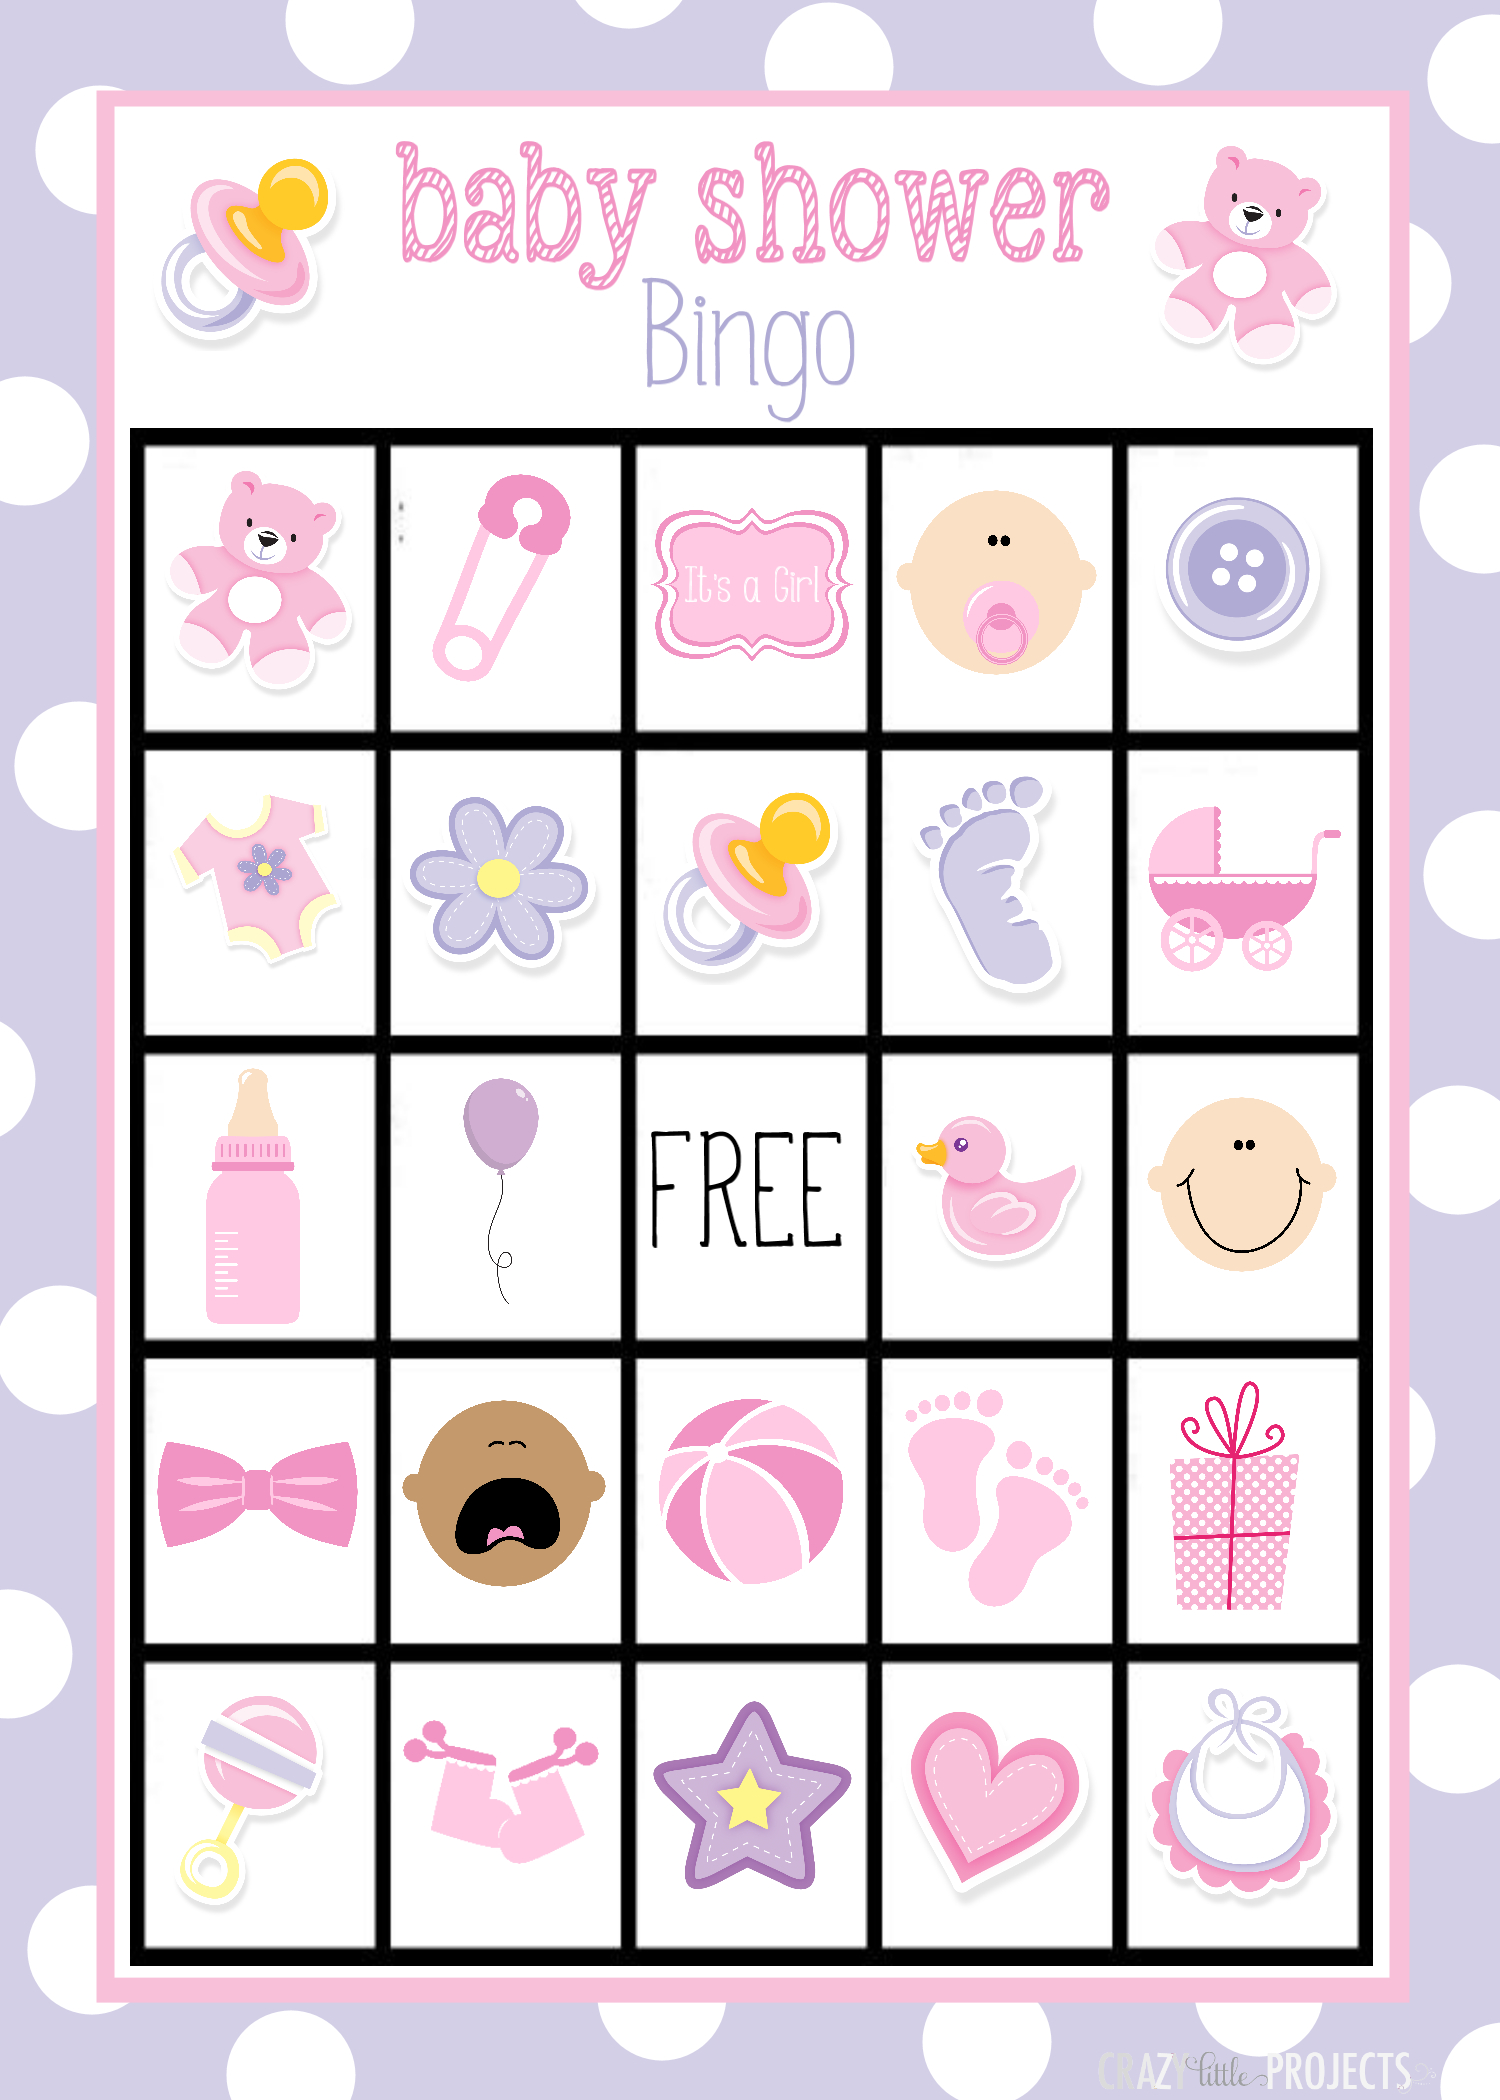 Baby Shower Bingo Cards - Baby Bingo Game Free Printable